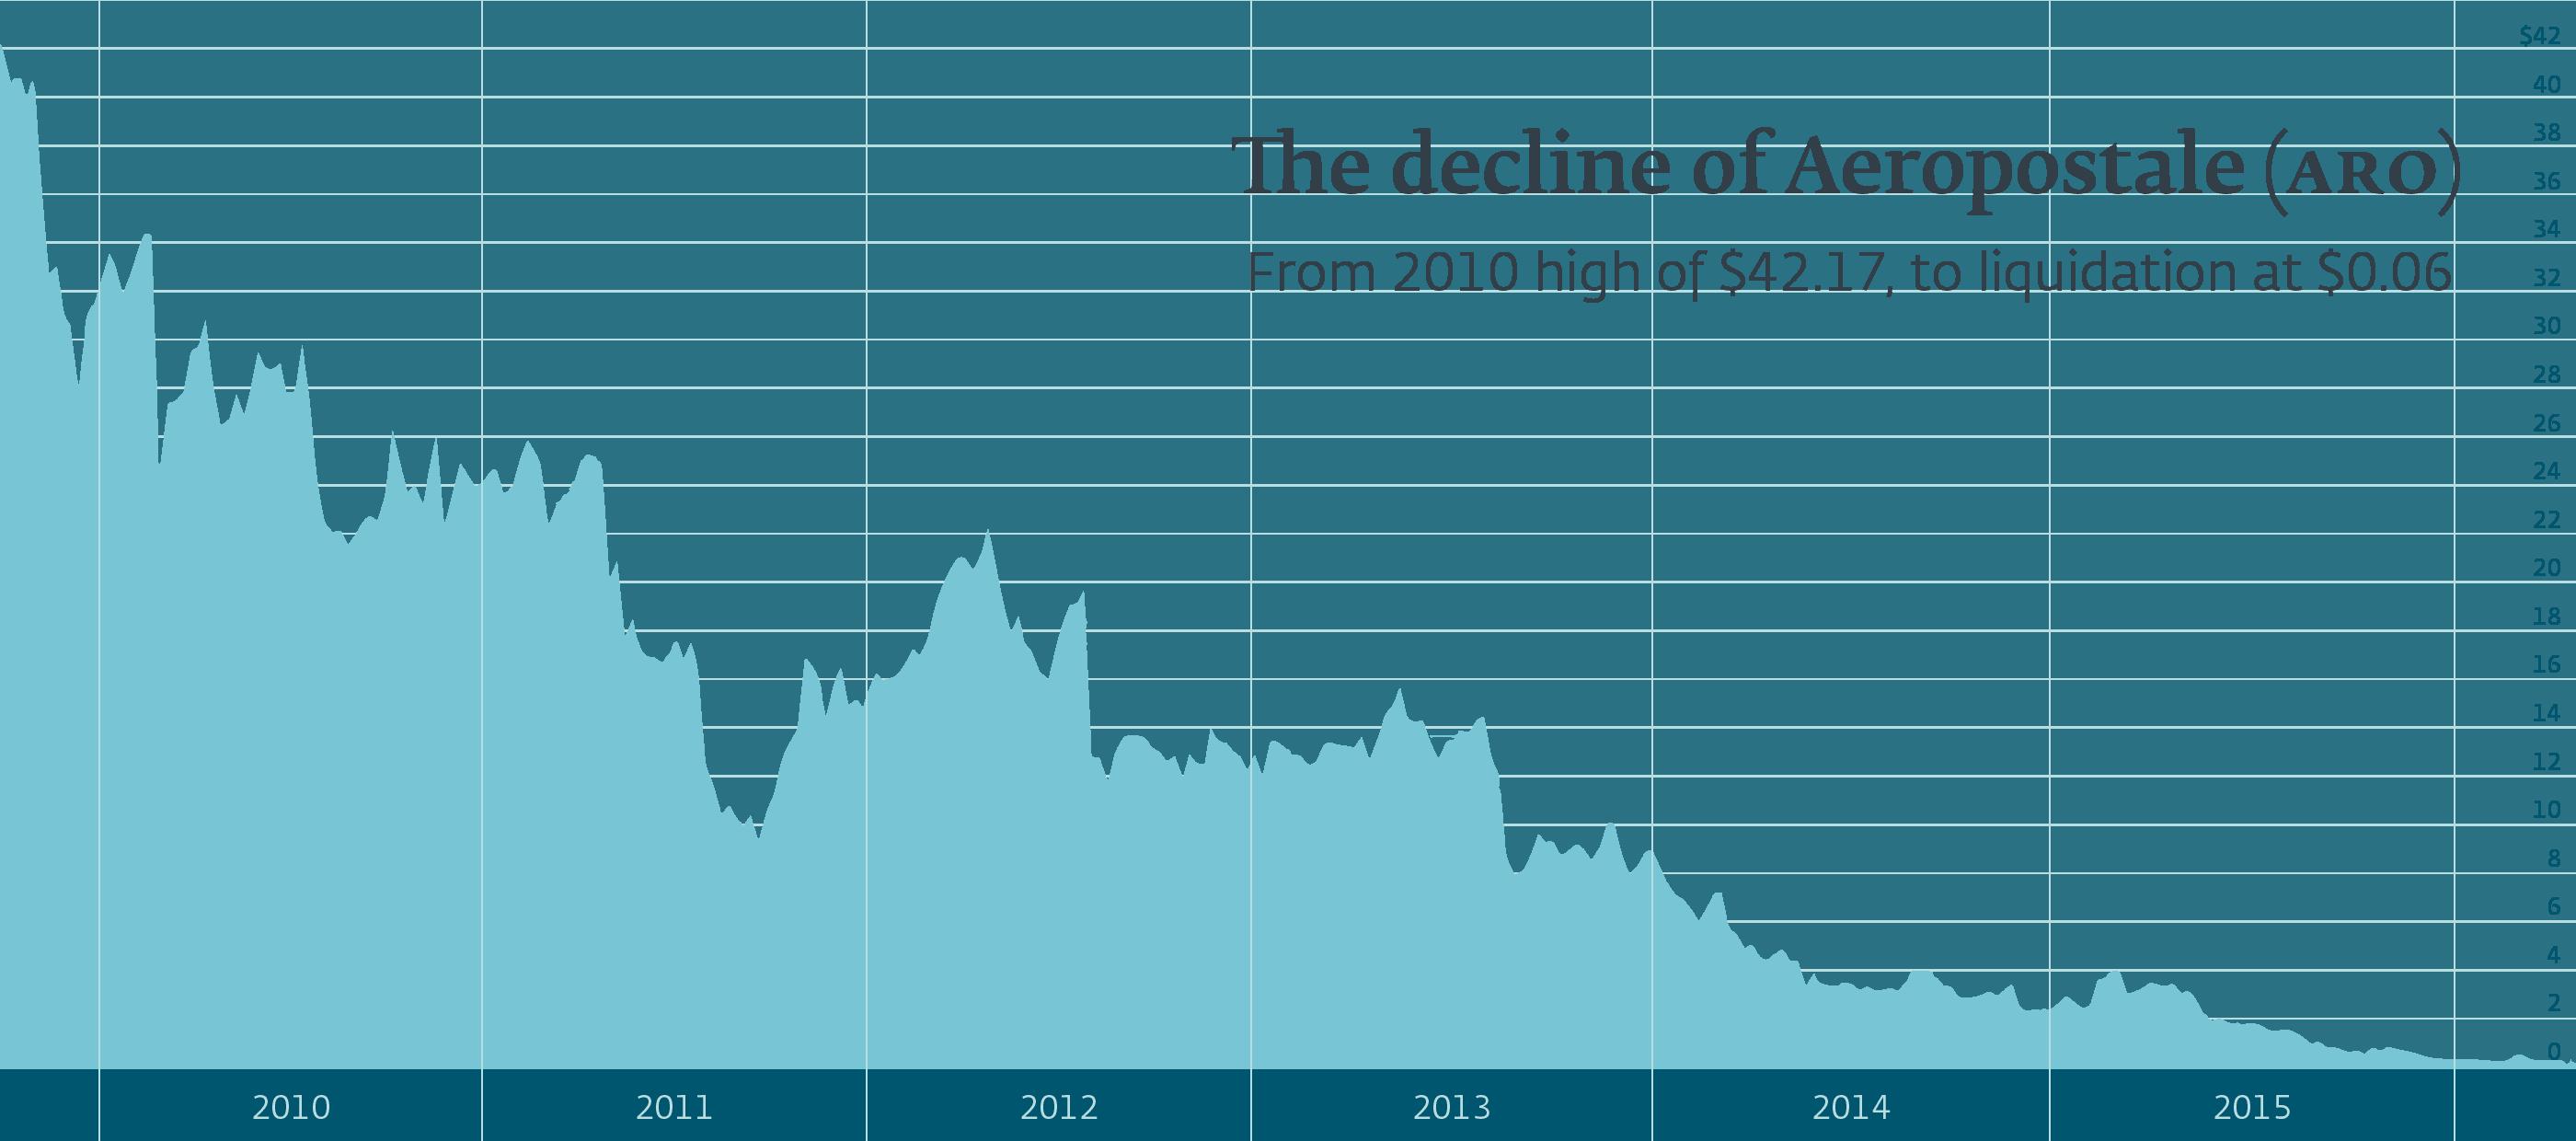 Illustrated: Aeropostale Stock Decline, 2010 to 2015